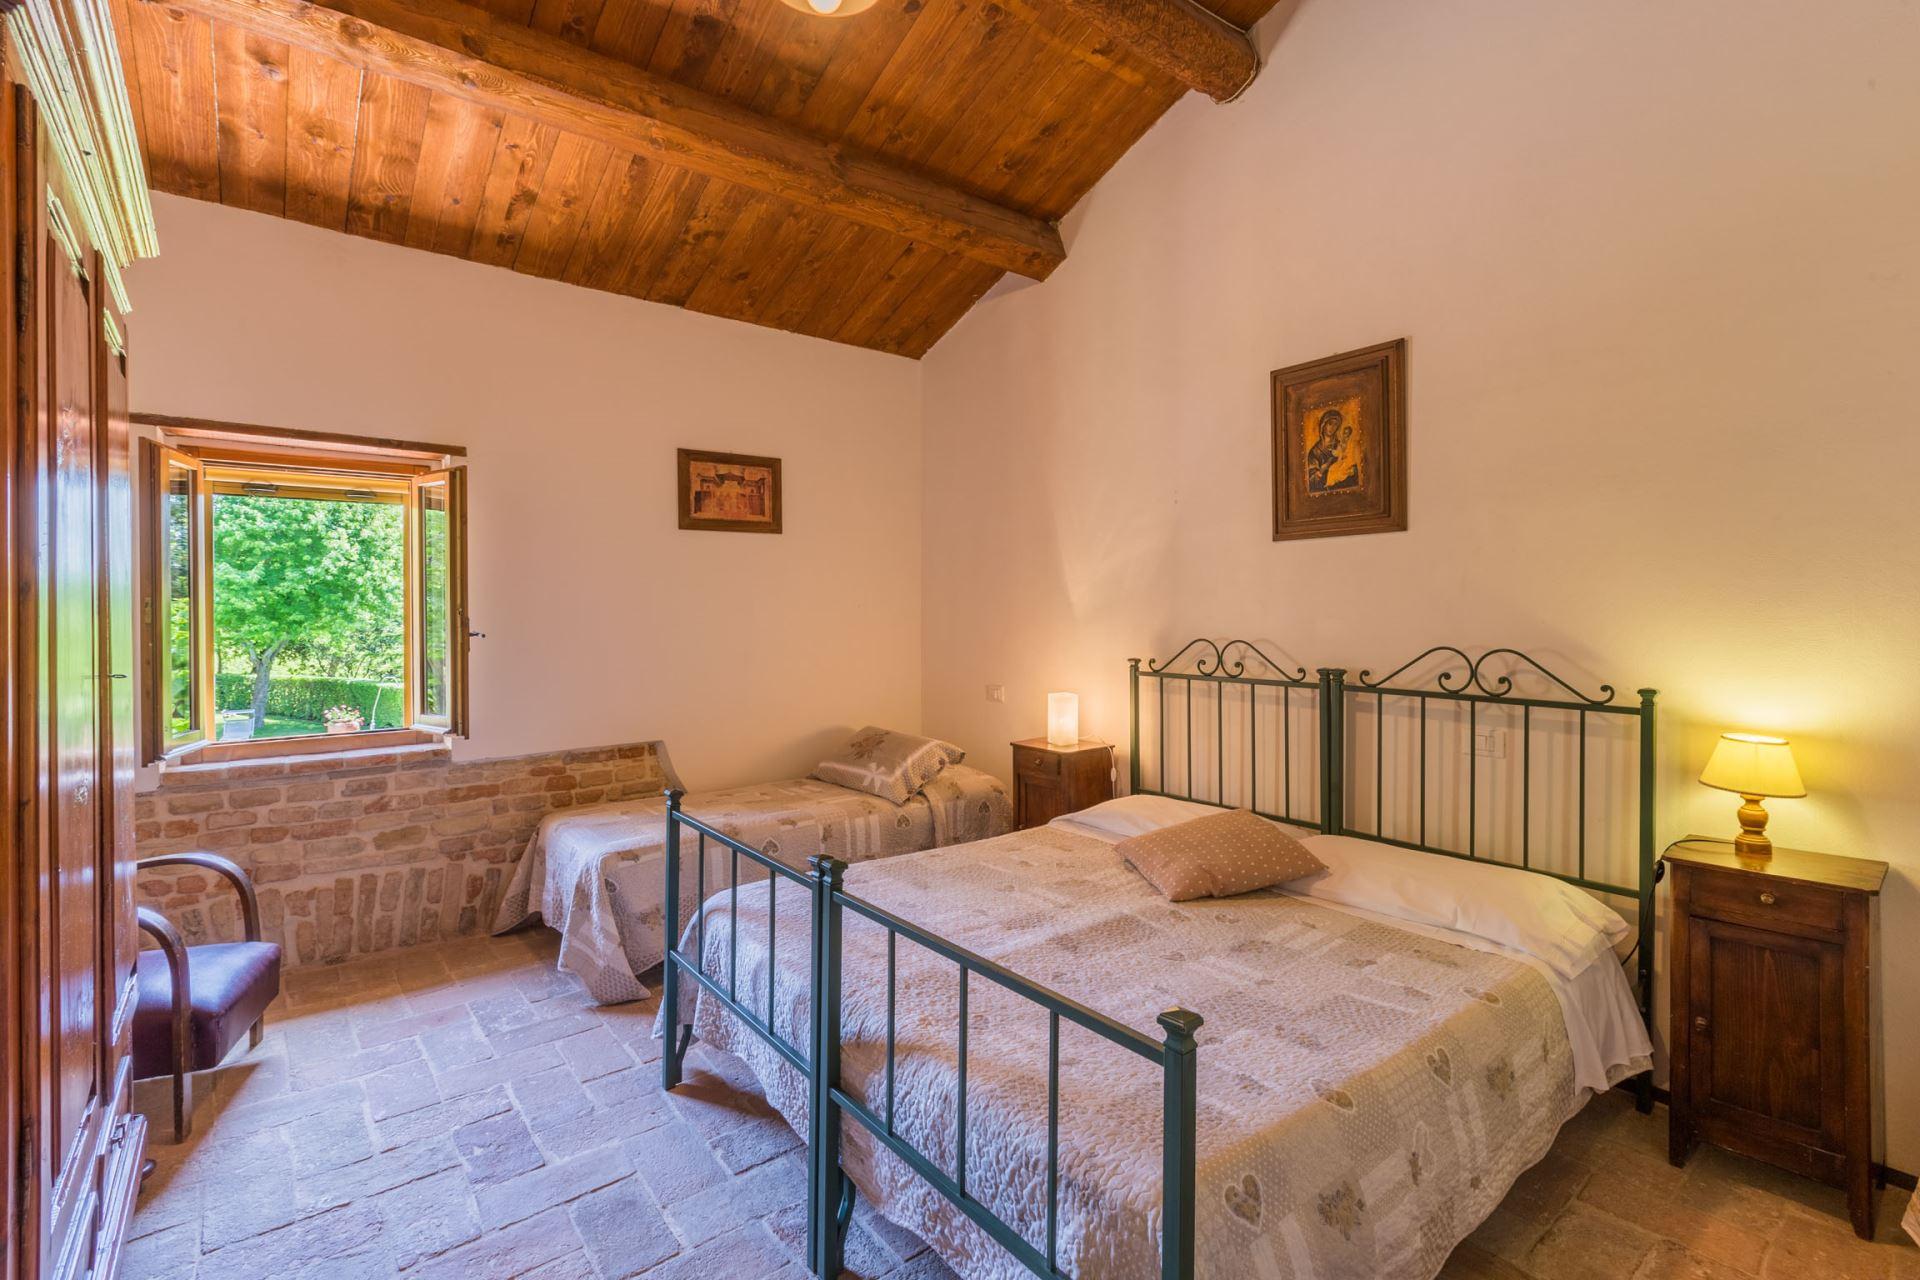 Ferienhaus VILLA DELLE VIGNE (2129909), Pesaro, Pesaro und Urbino, Marken, Italien, Bild 10